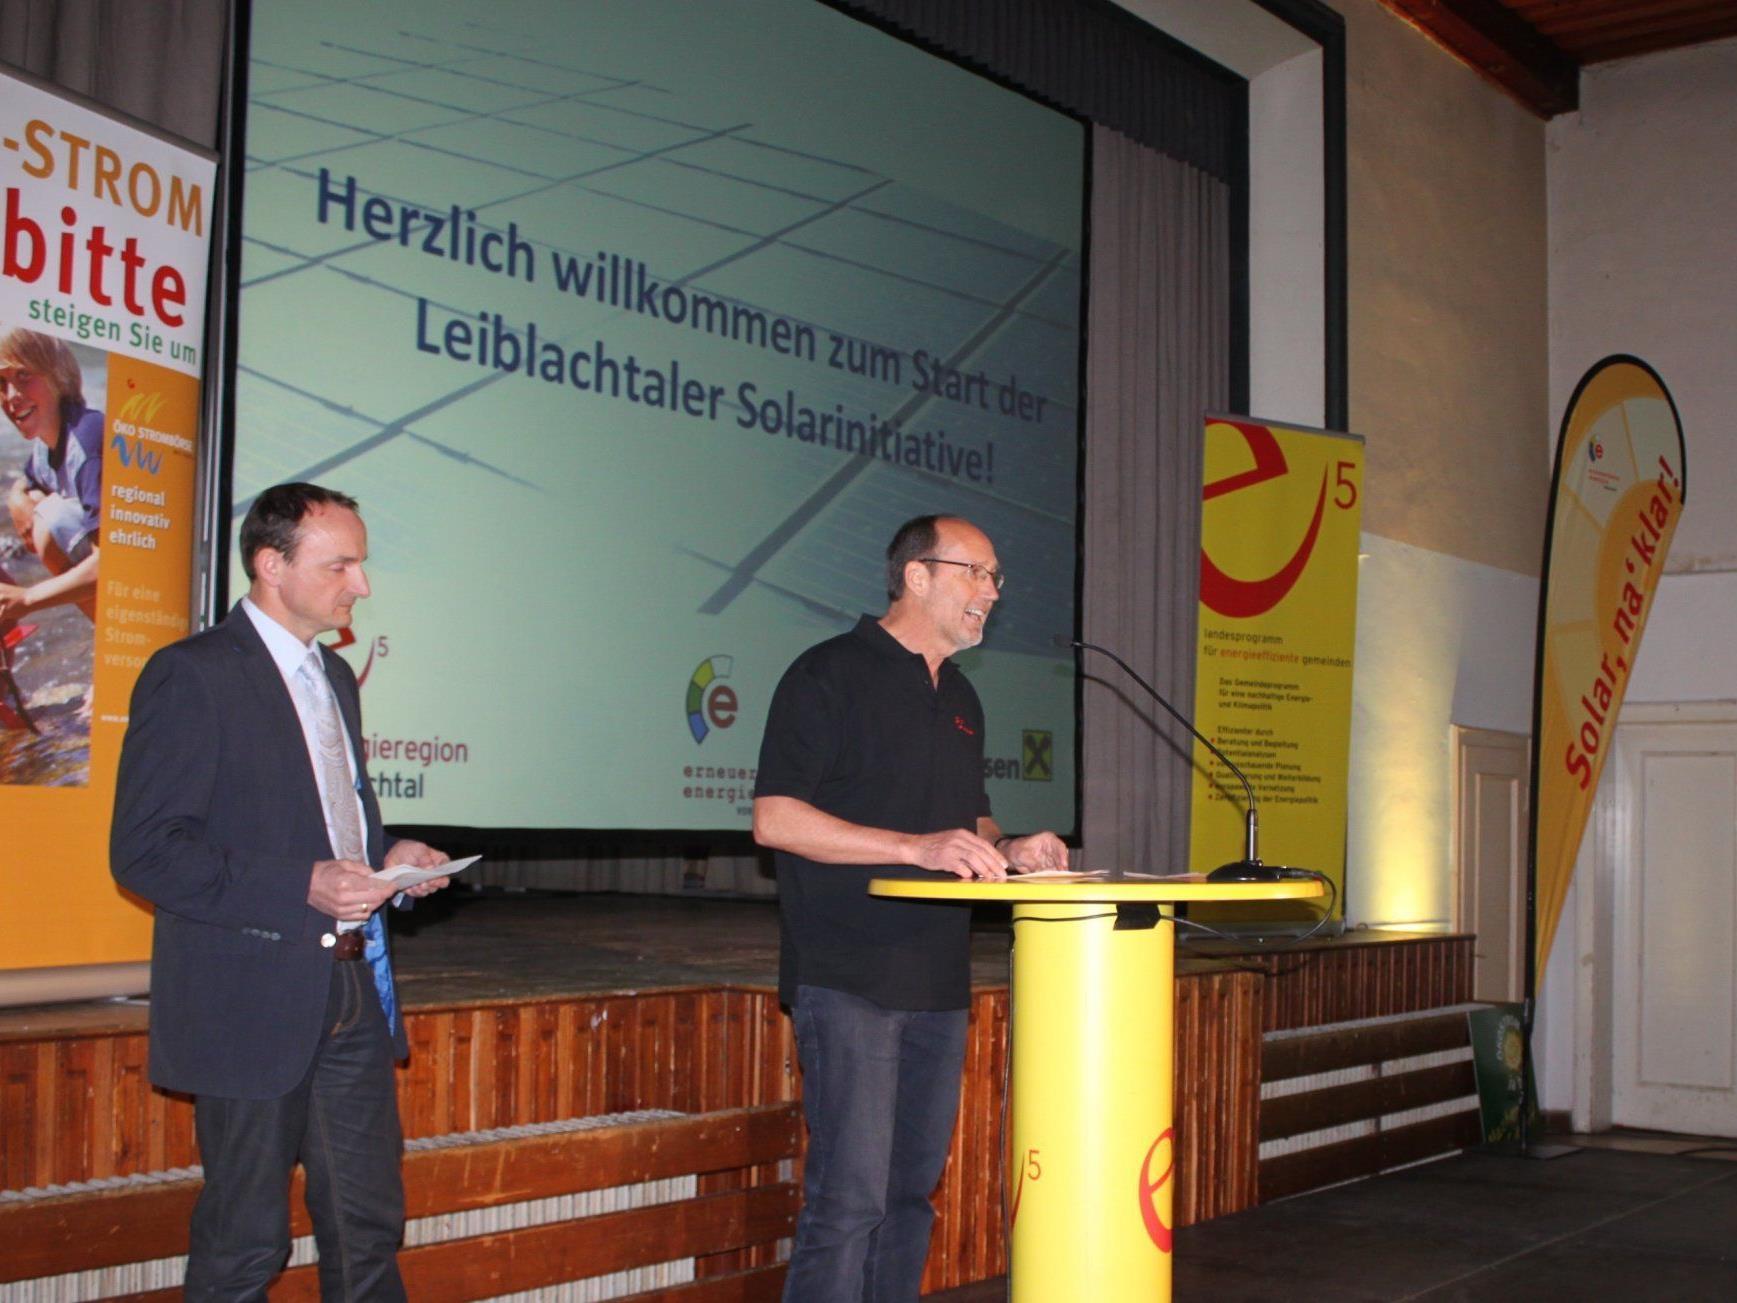 Energieregion Leiblachtal startet energieautonome Solarinitiative mit Bürgerbeteiligung.